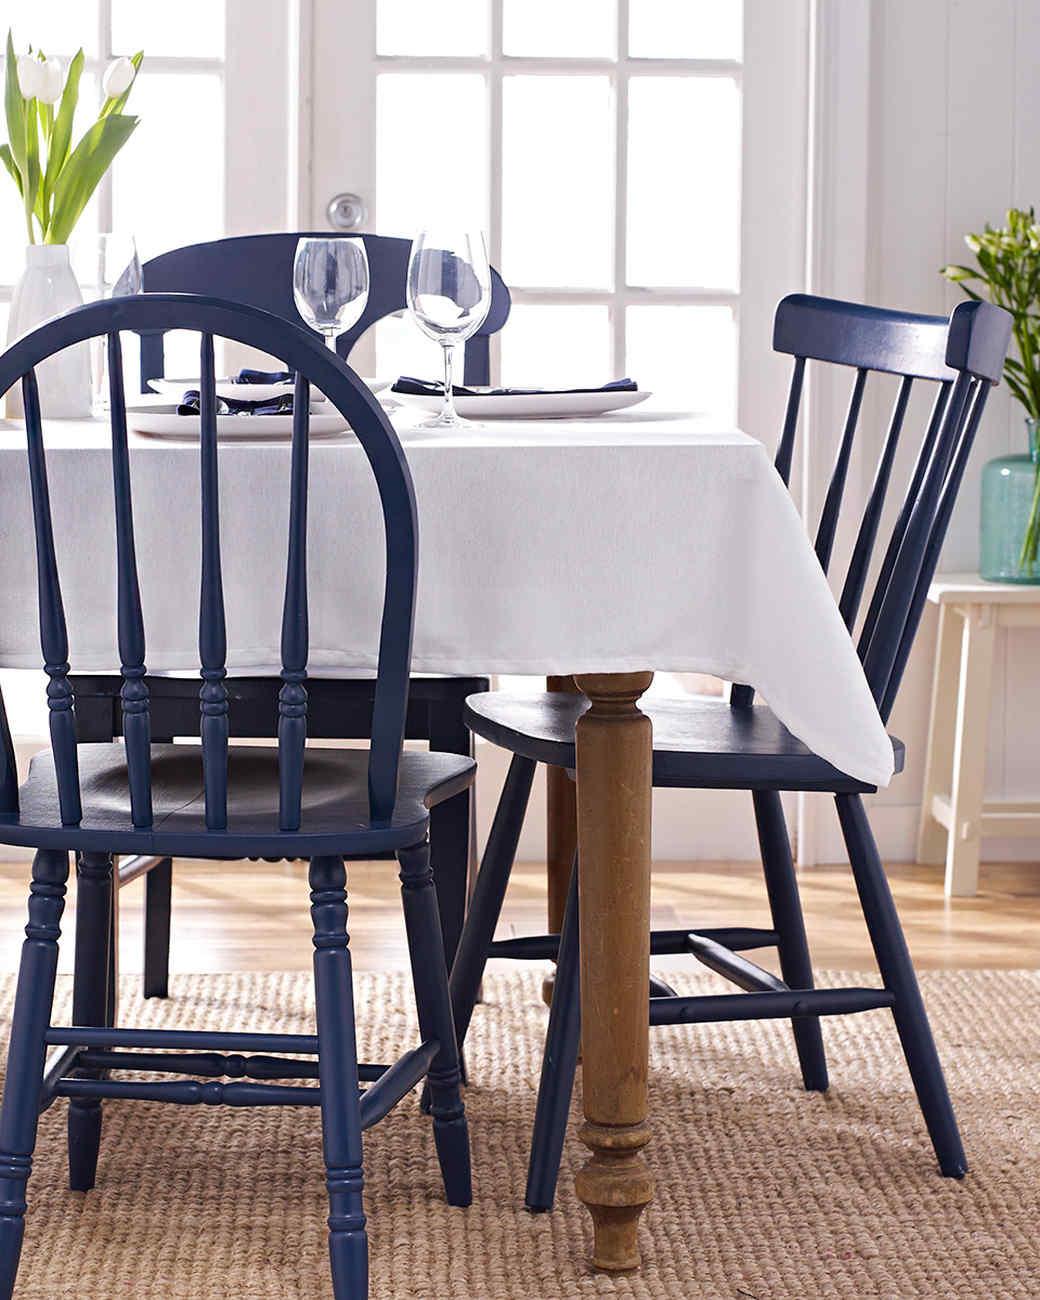 Ordinaire Plaid Decor Chairs